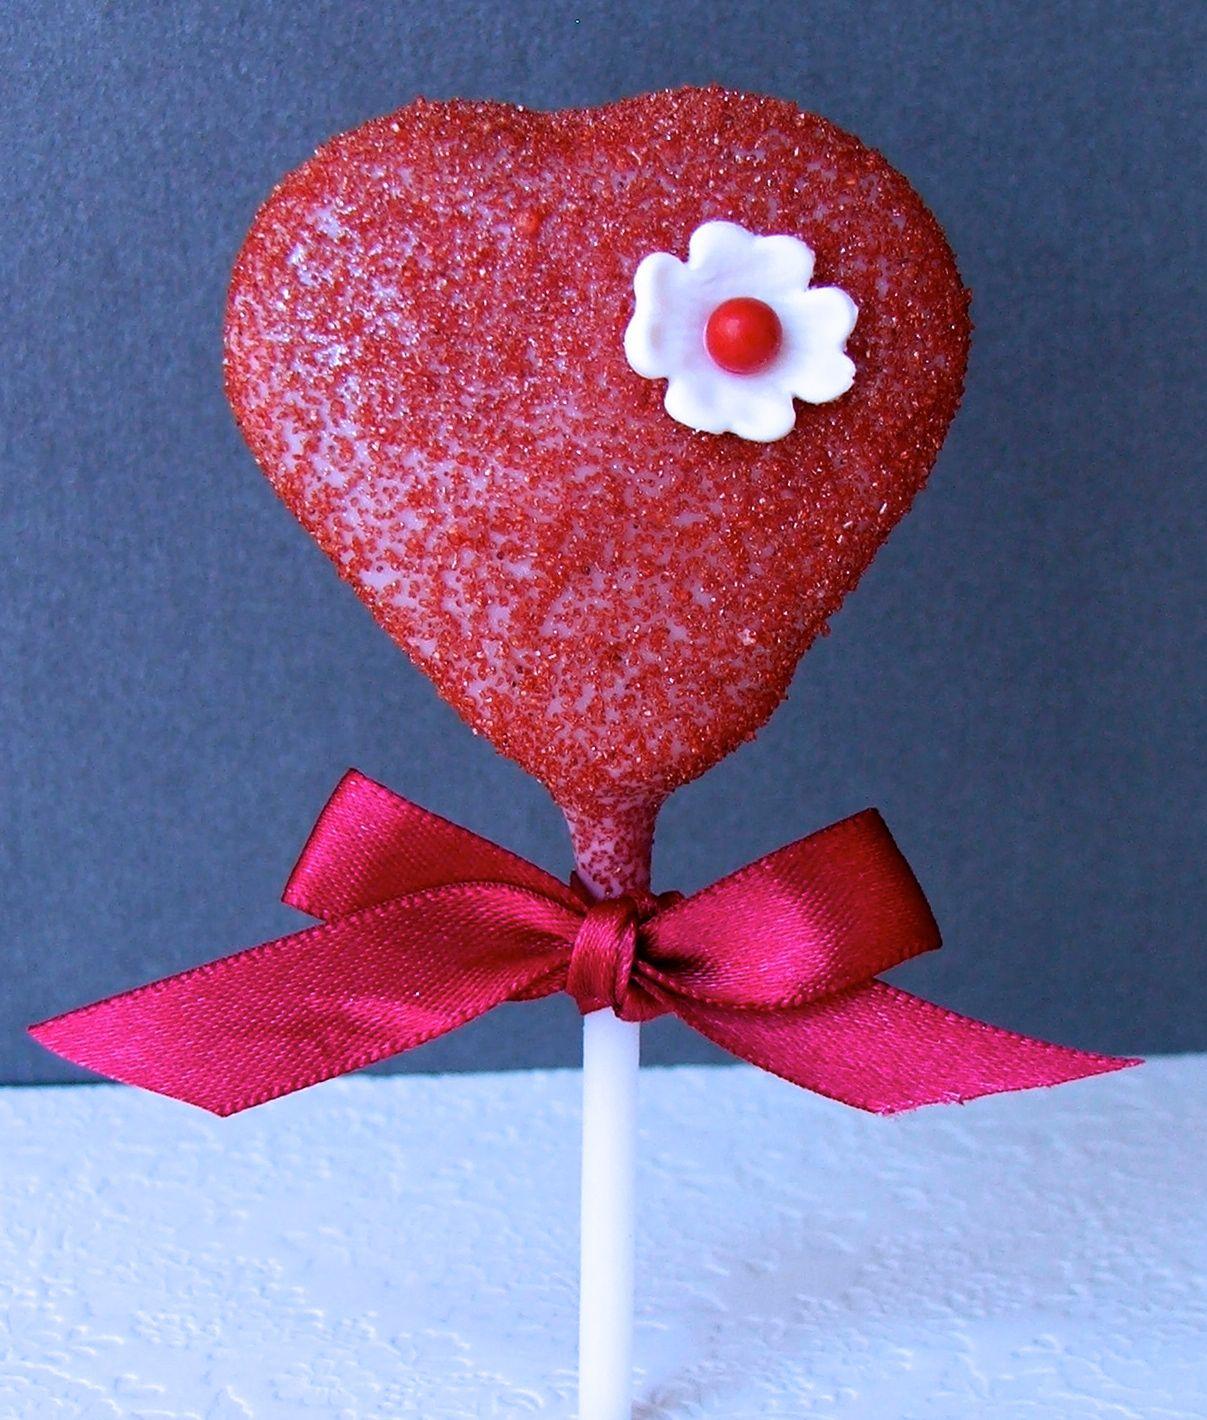 Red Heart Cake Pop